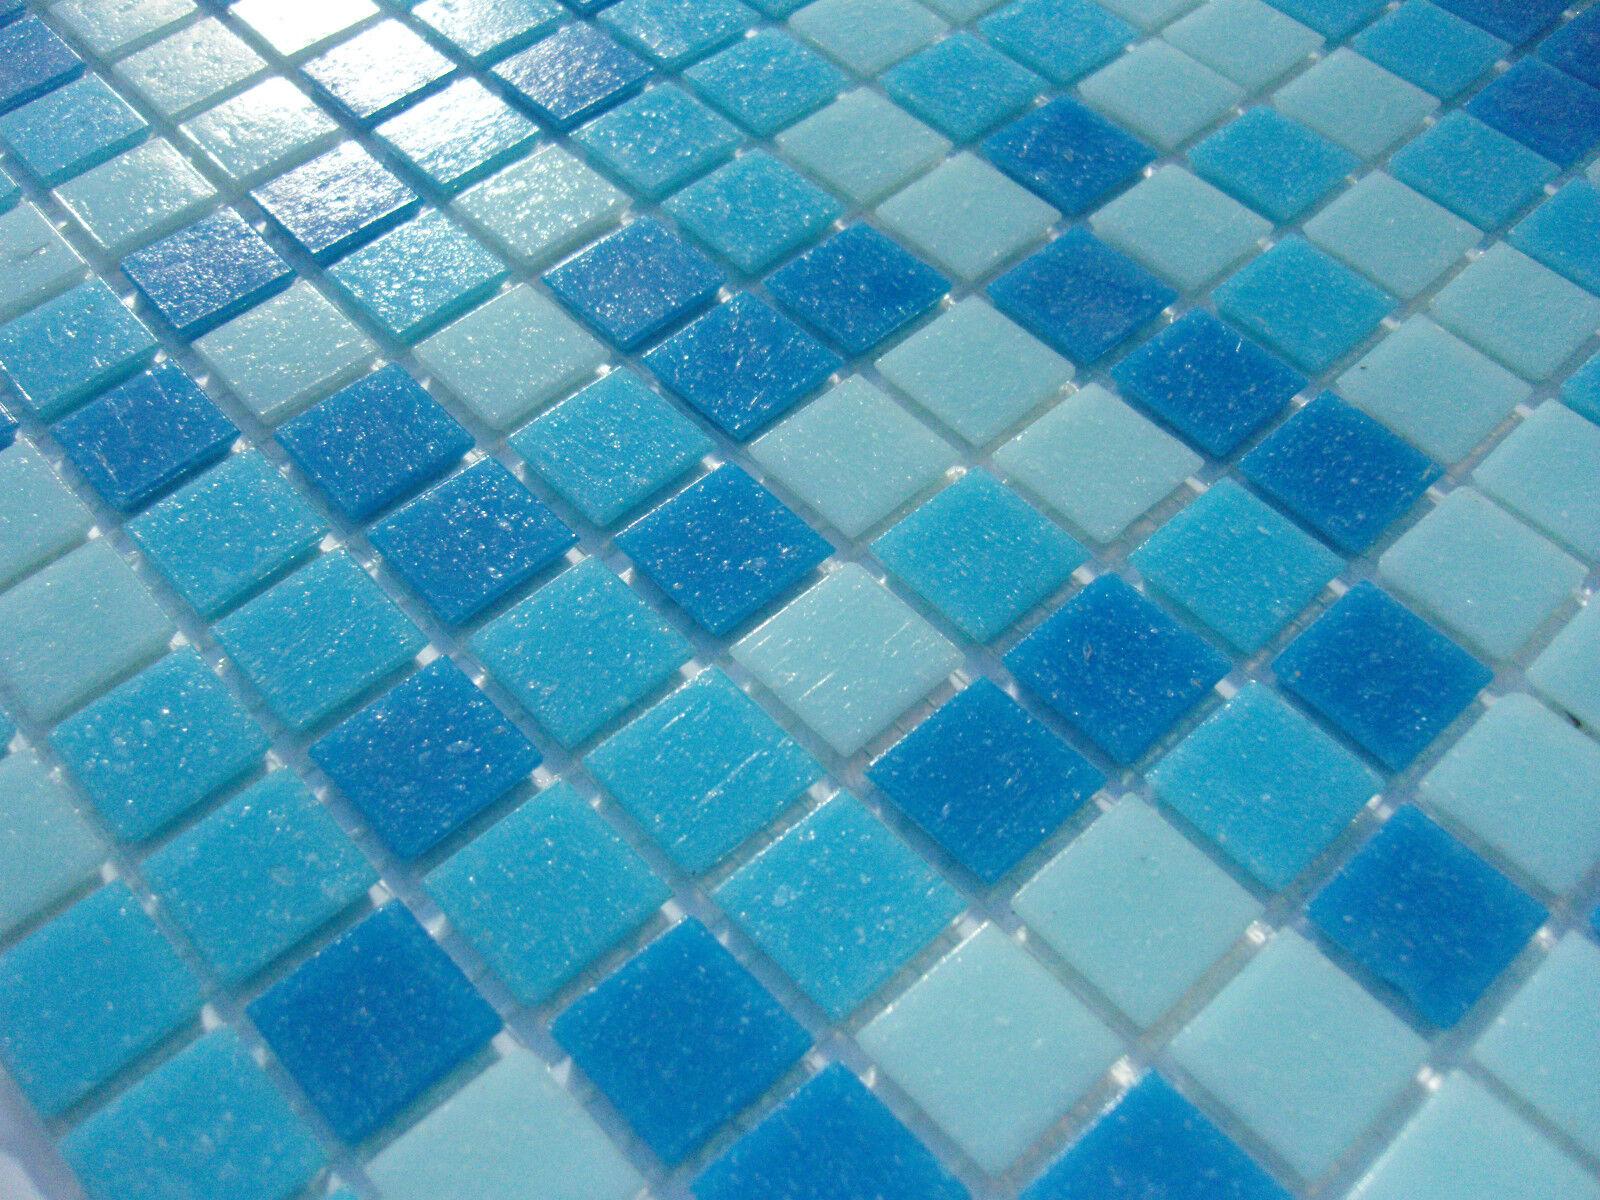 1qm glasmosaik fliesen pool dusche bad azur blau hellblau dunkelblau sauna mix eur 22 95. Black Bedroom Furniture Sets. Home Design Ideas